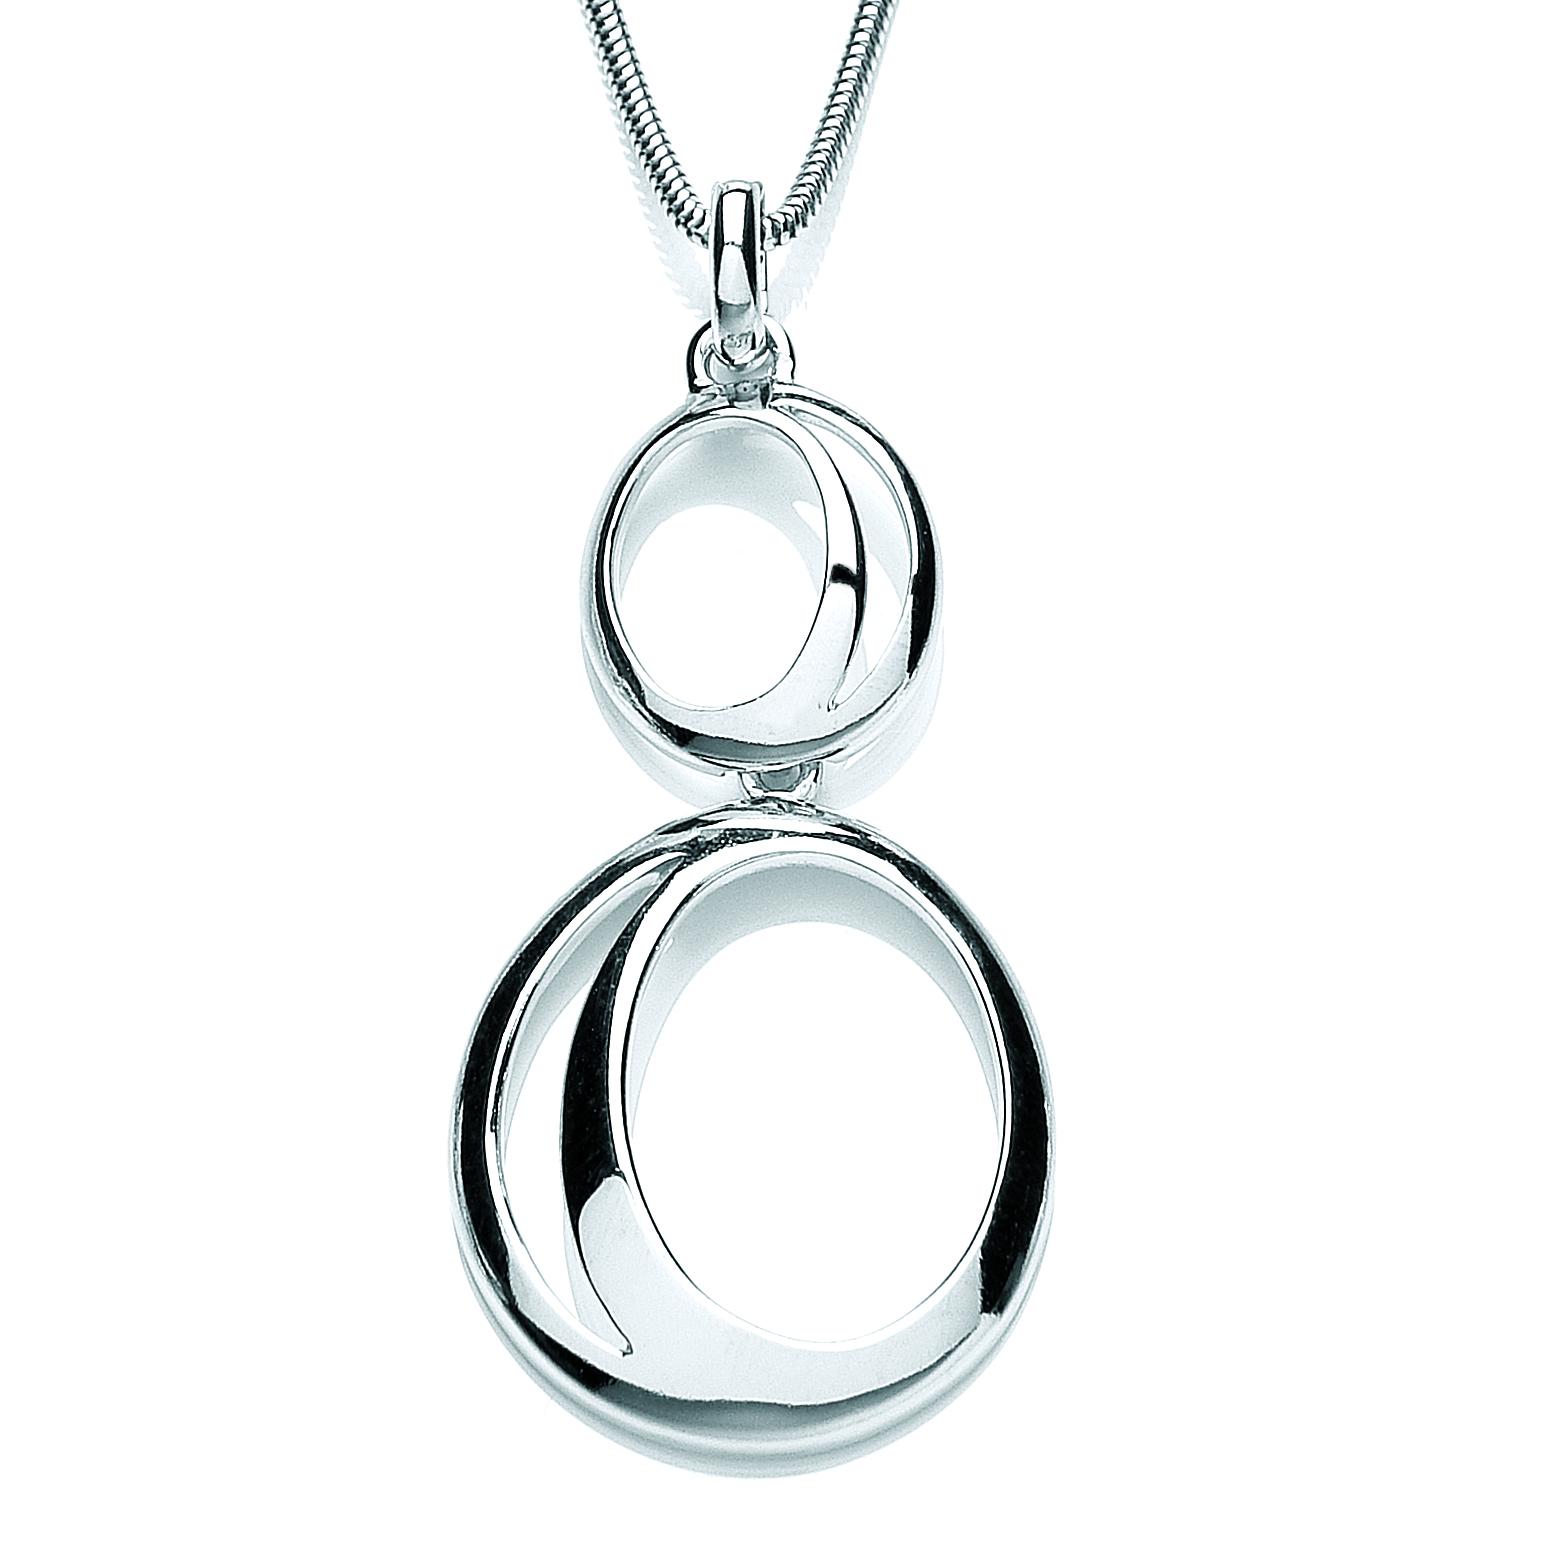 Silver purity pendant